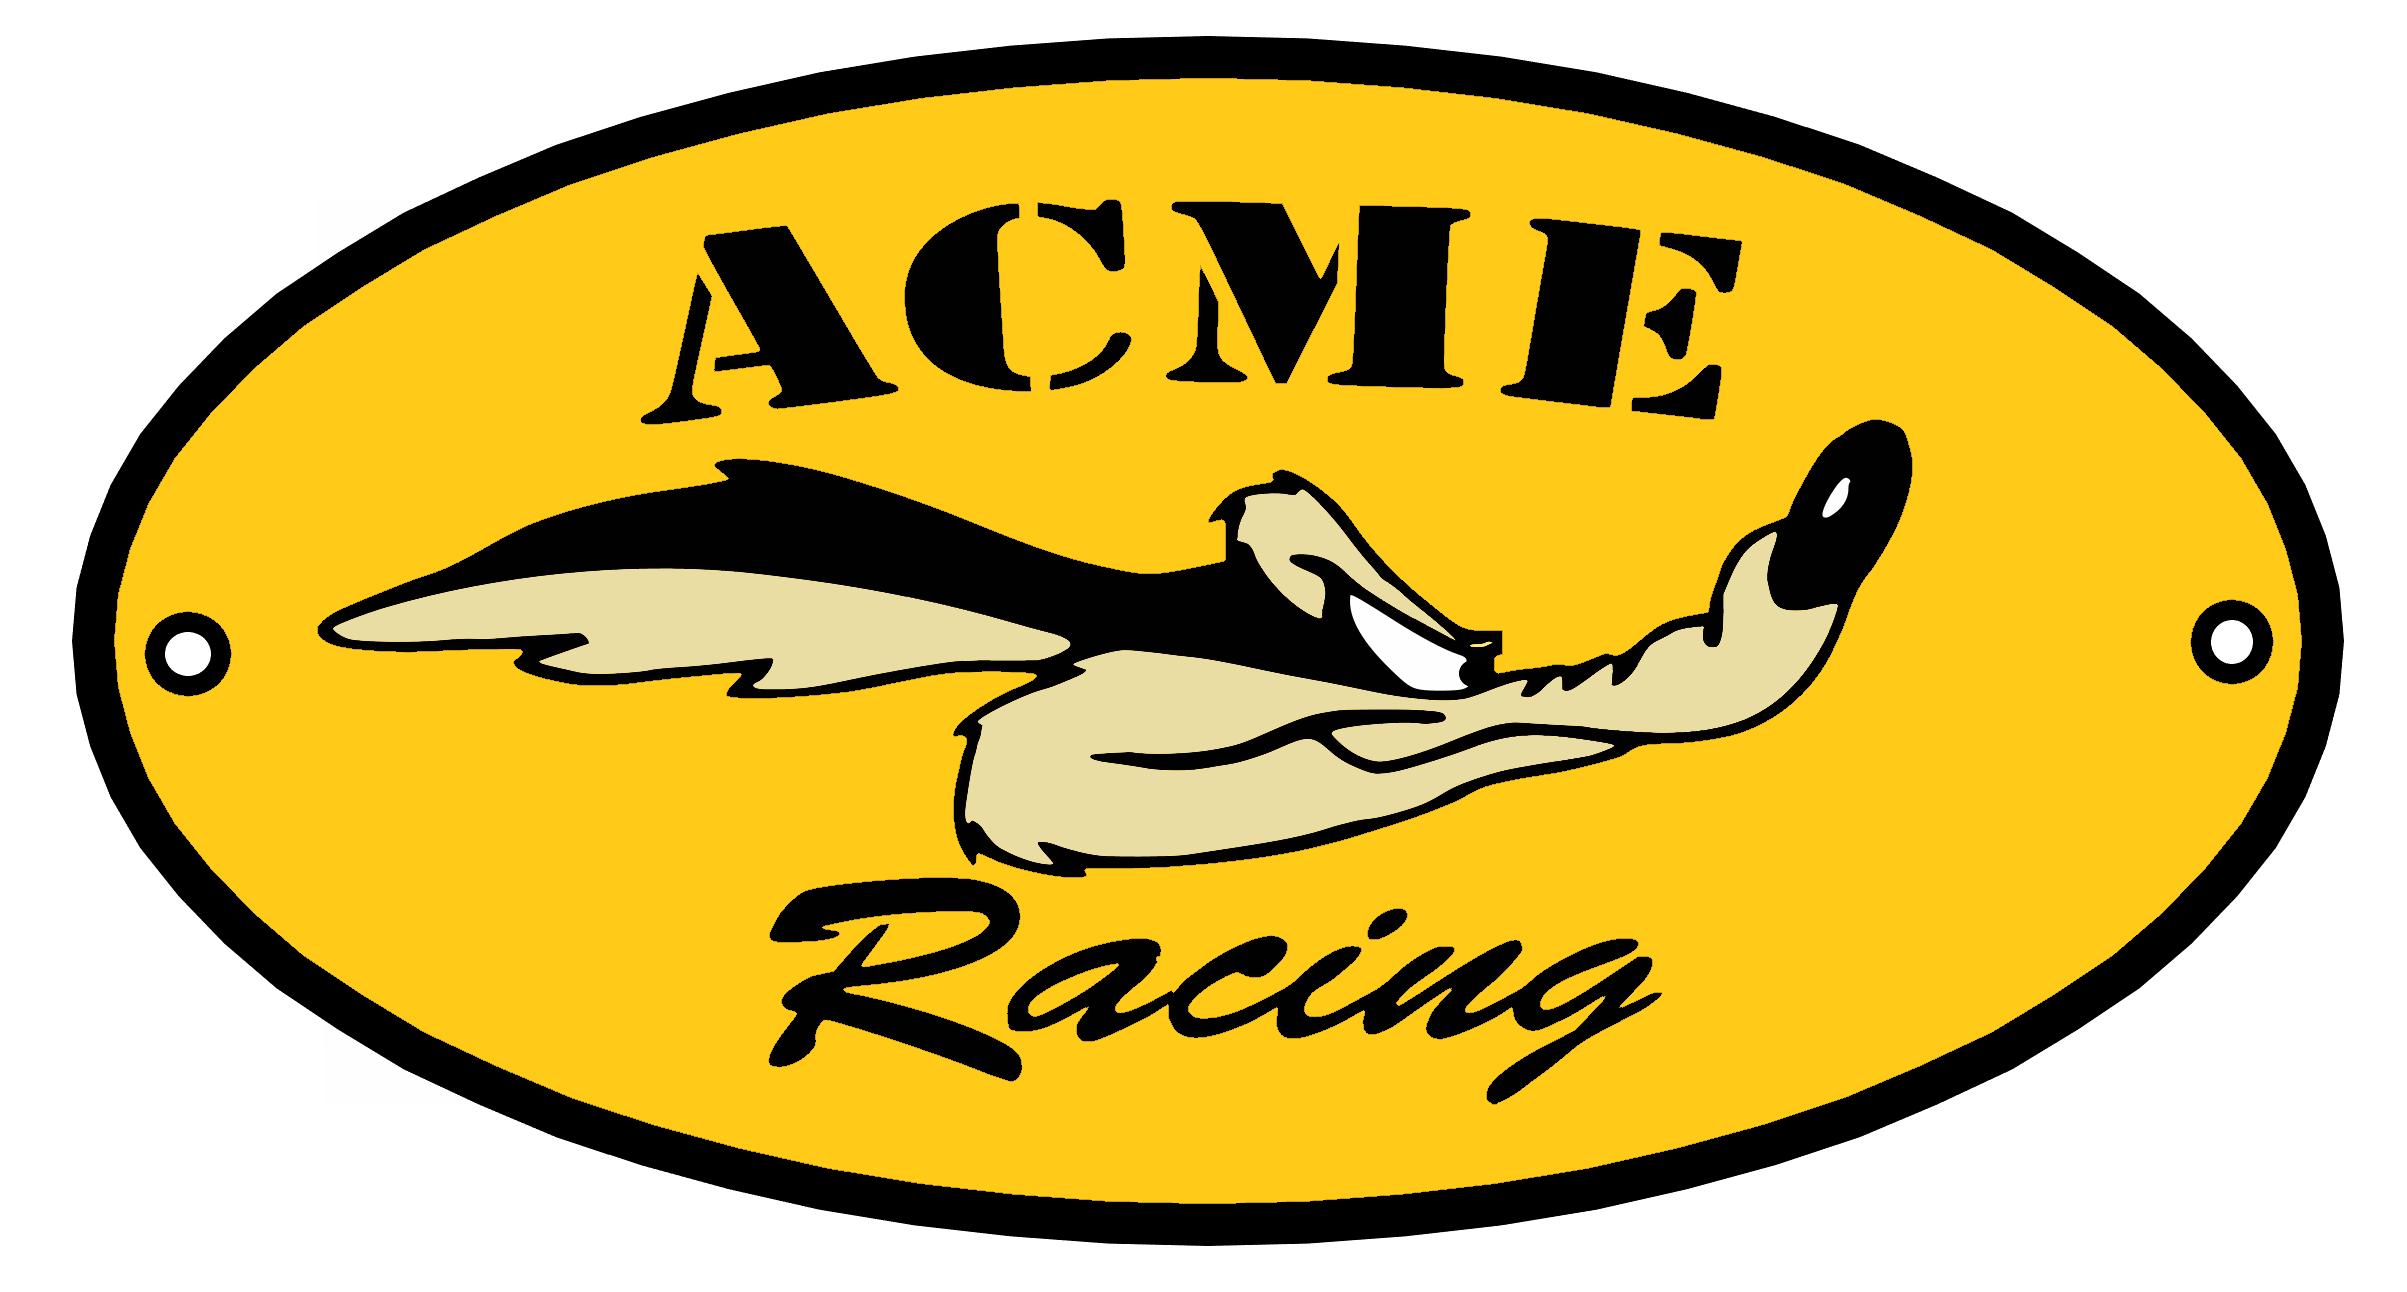 Wile E Coyote Coyote Acme Cartoon Wylie Coyote [ 1292 x 2407 Pixel ]